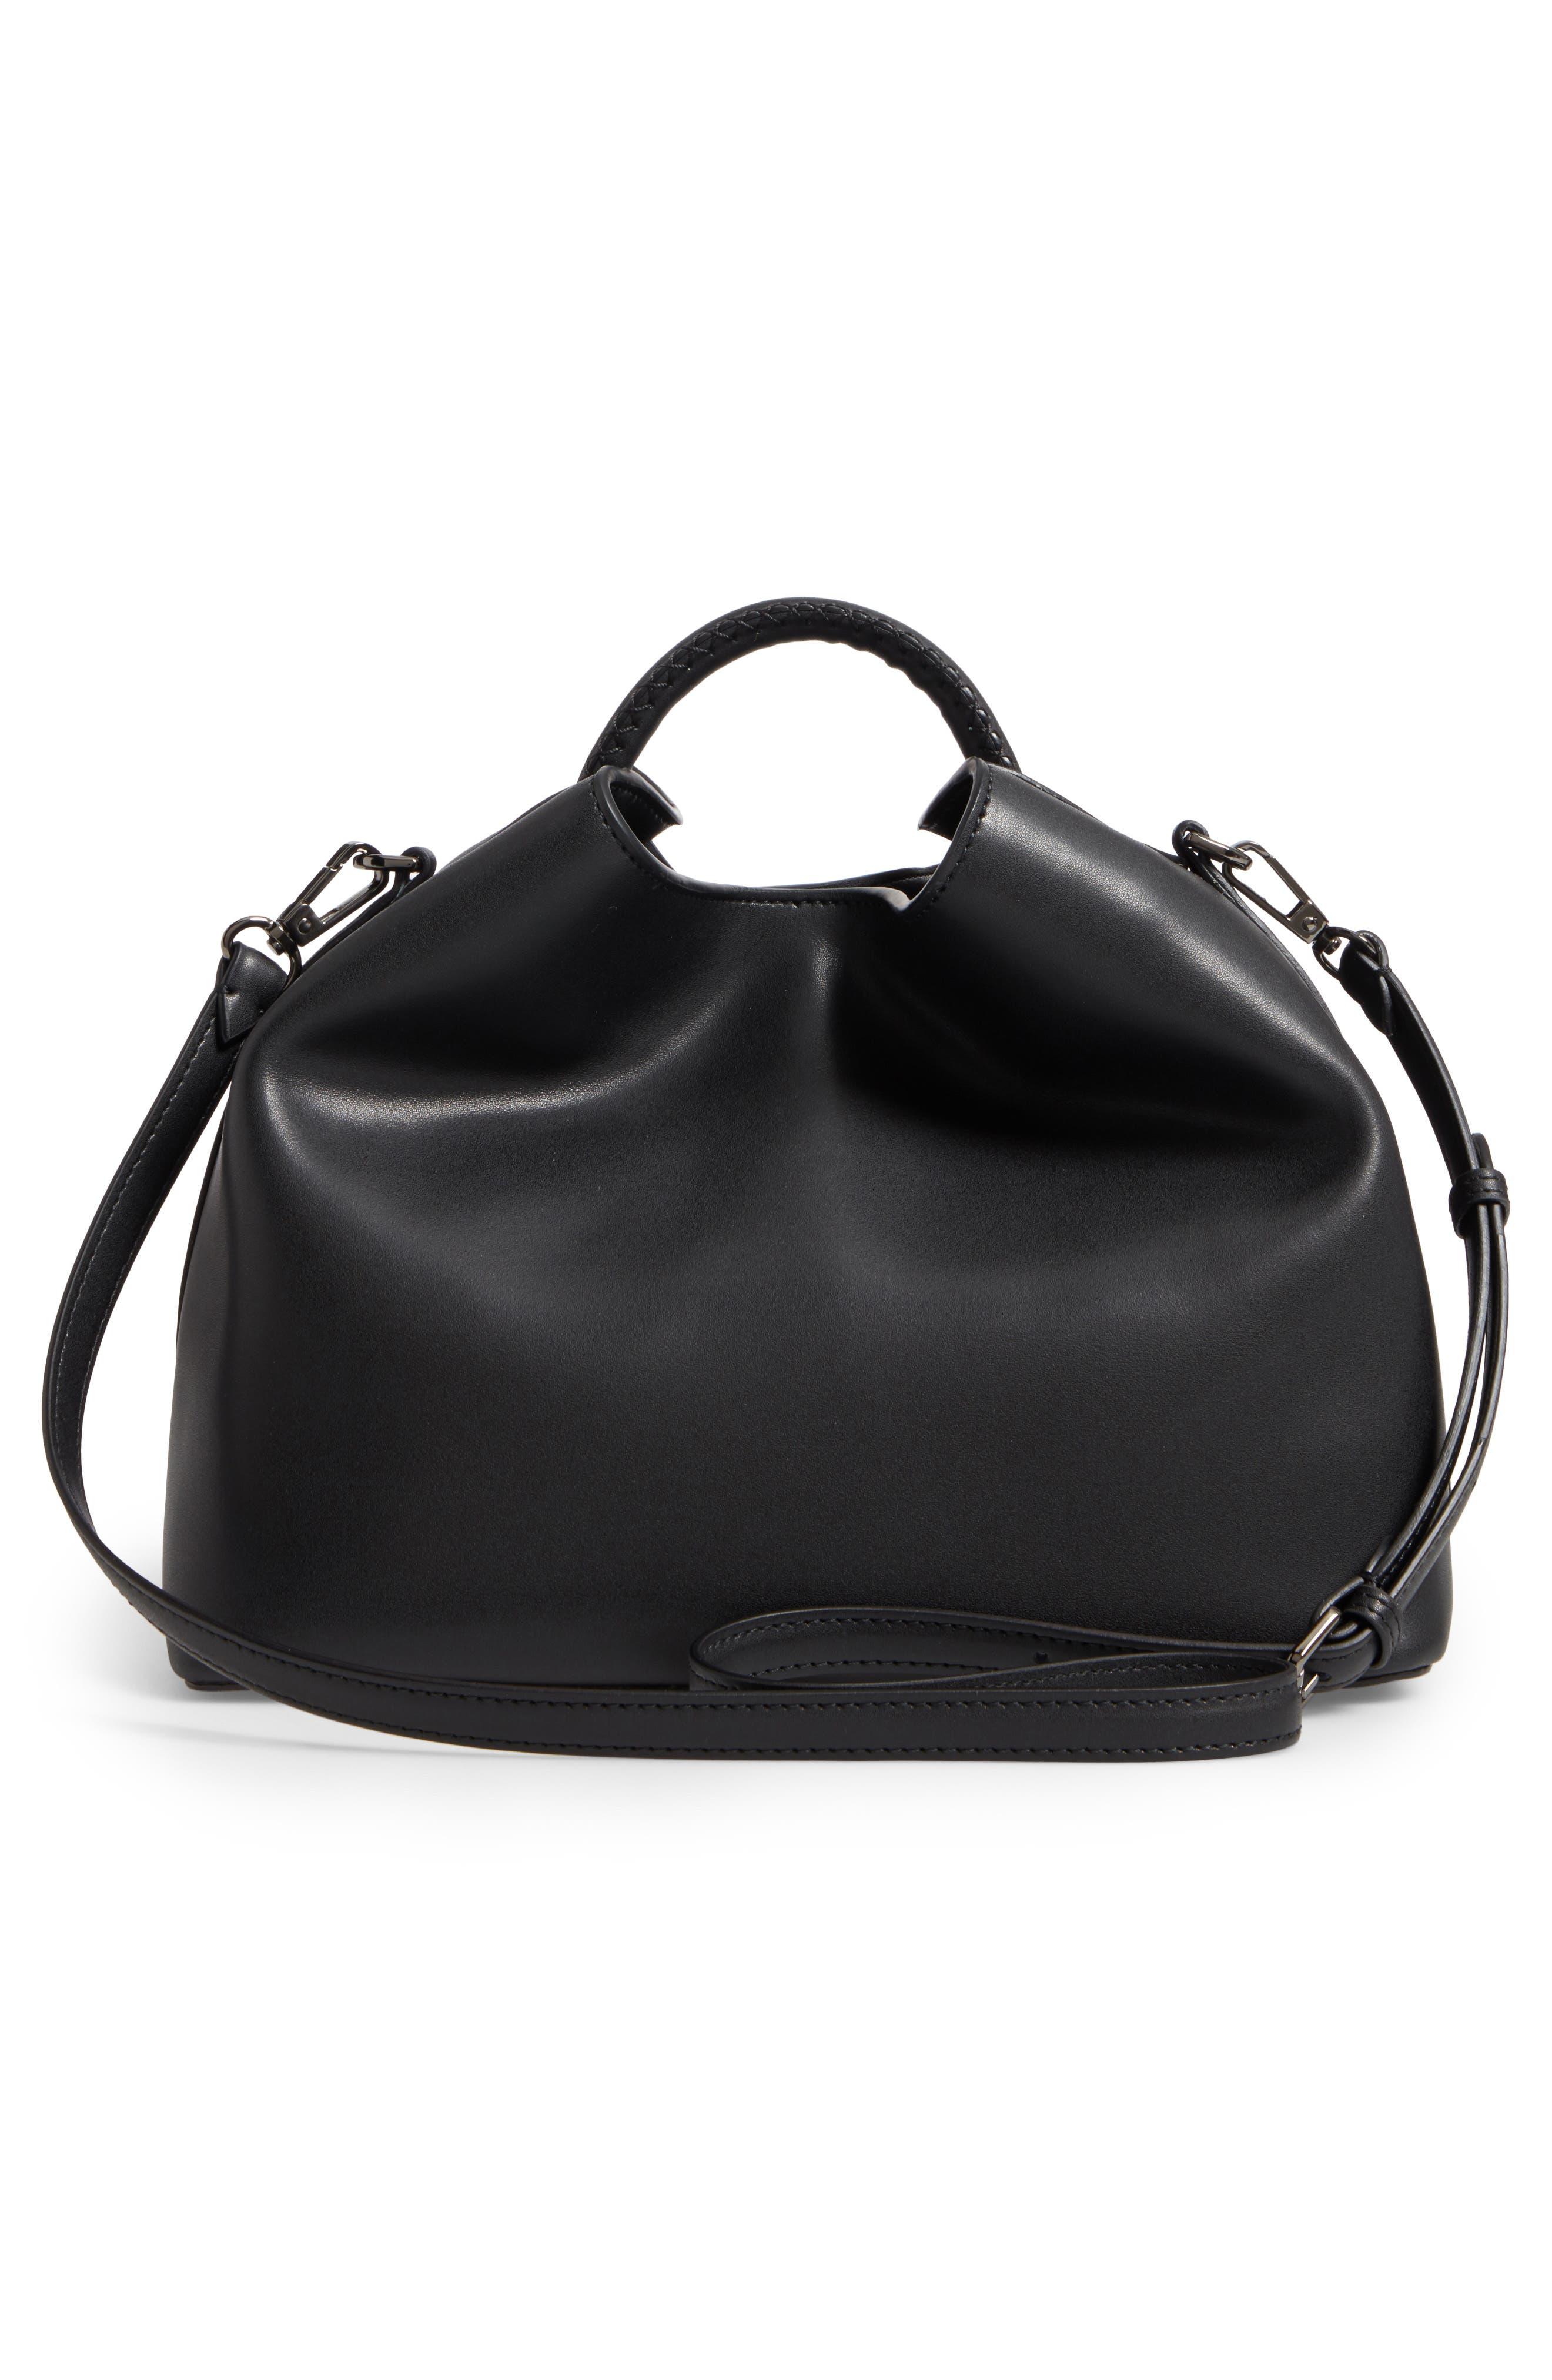 Raisin Leather Handbag,                             Alternate thumbnail 3, color,                             001